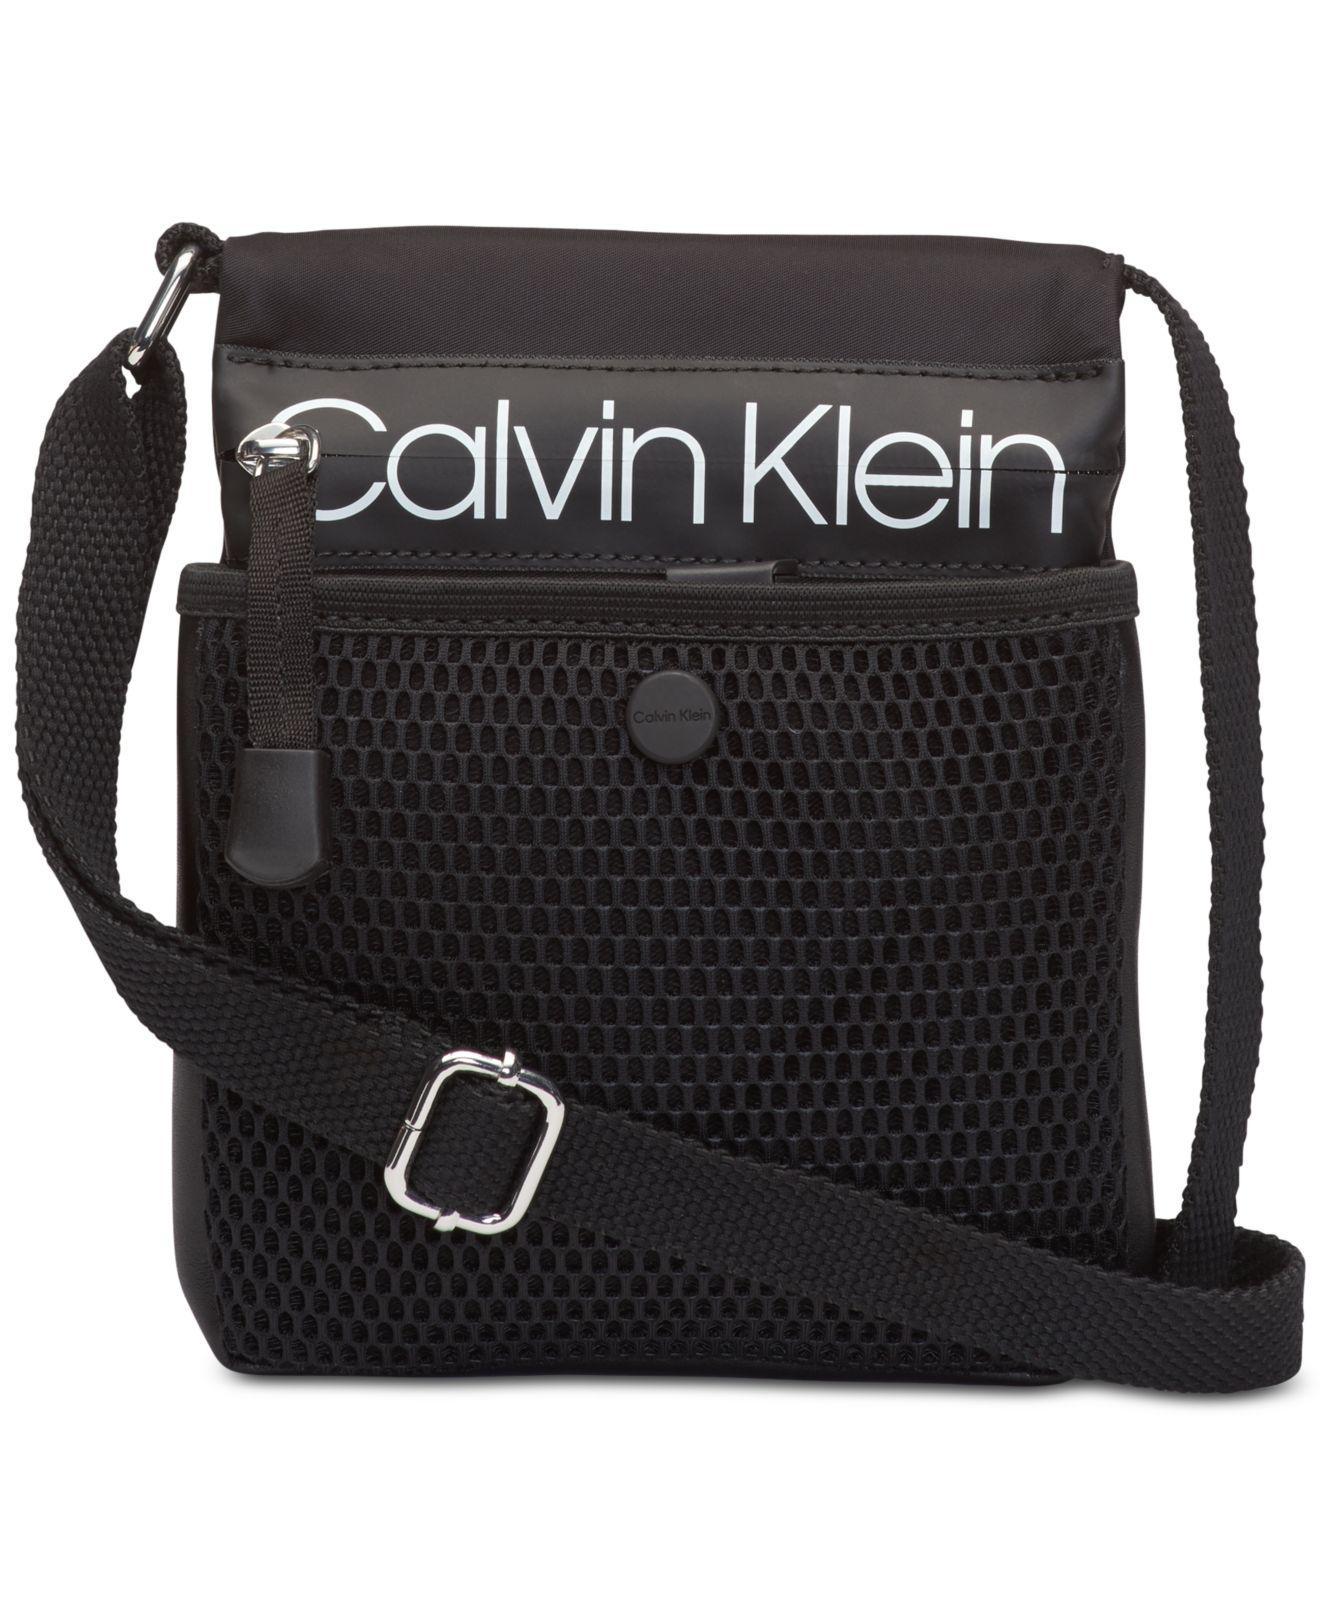 Calvin Klein - Black Tabbie Nylon Crossbody - Lyst. View fullscreen abfeedebc30c7